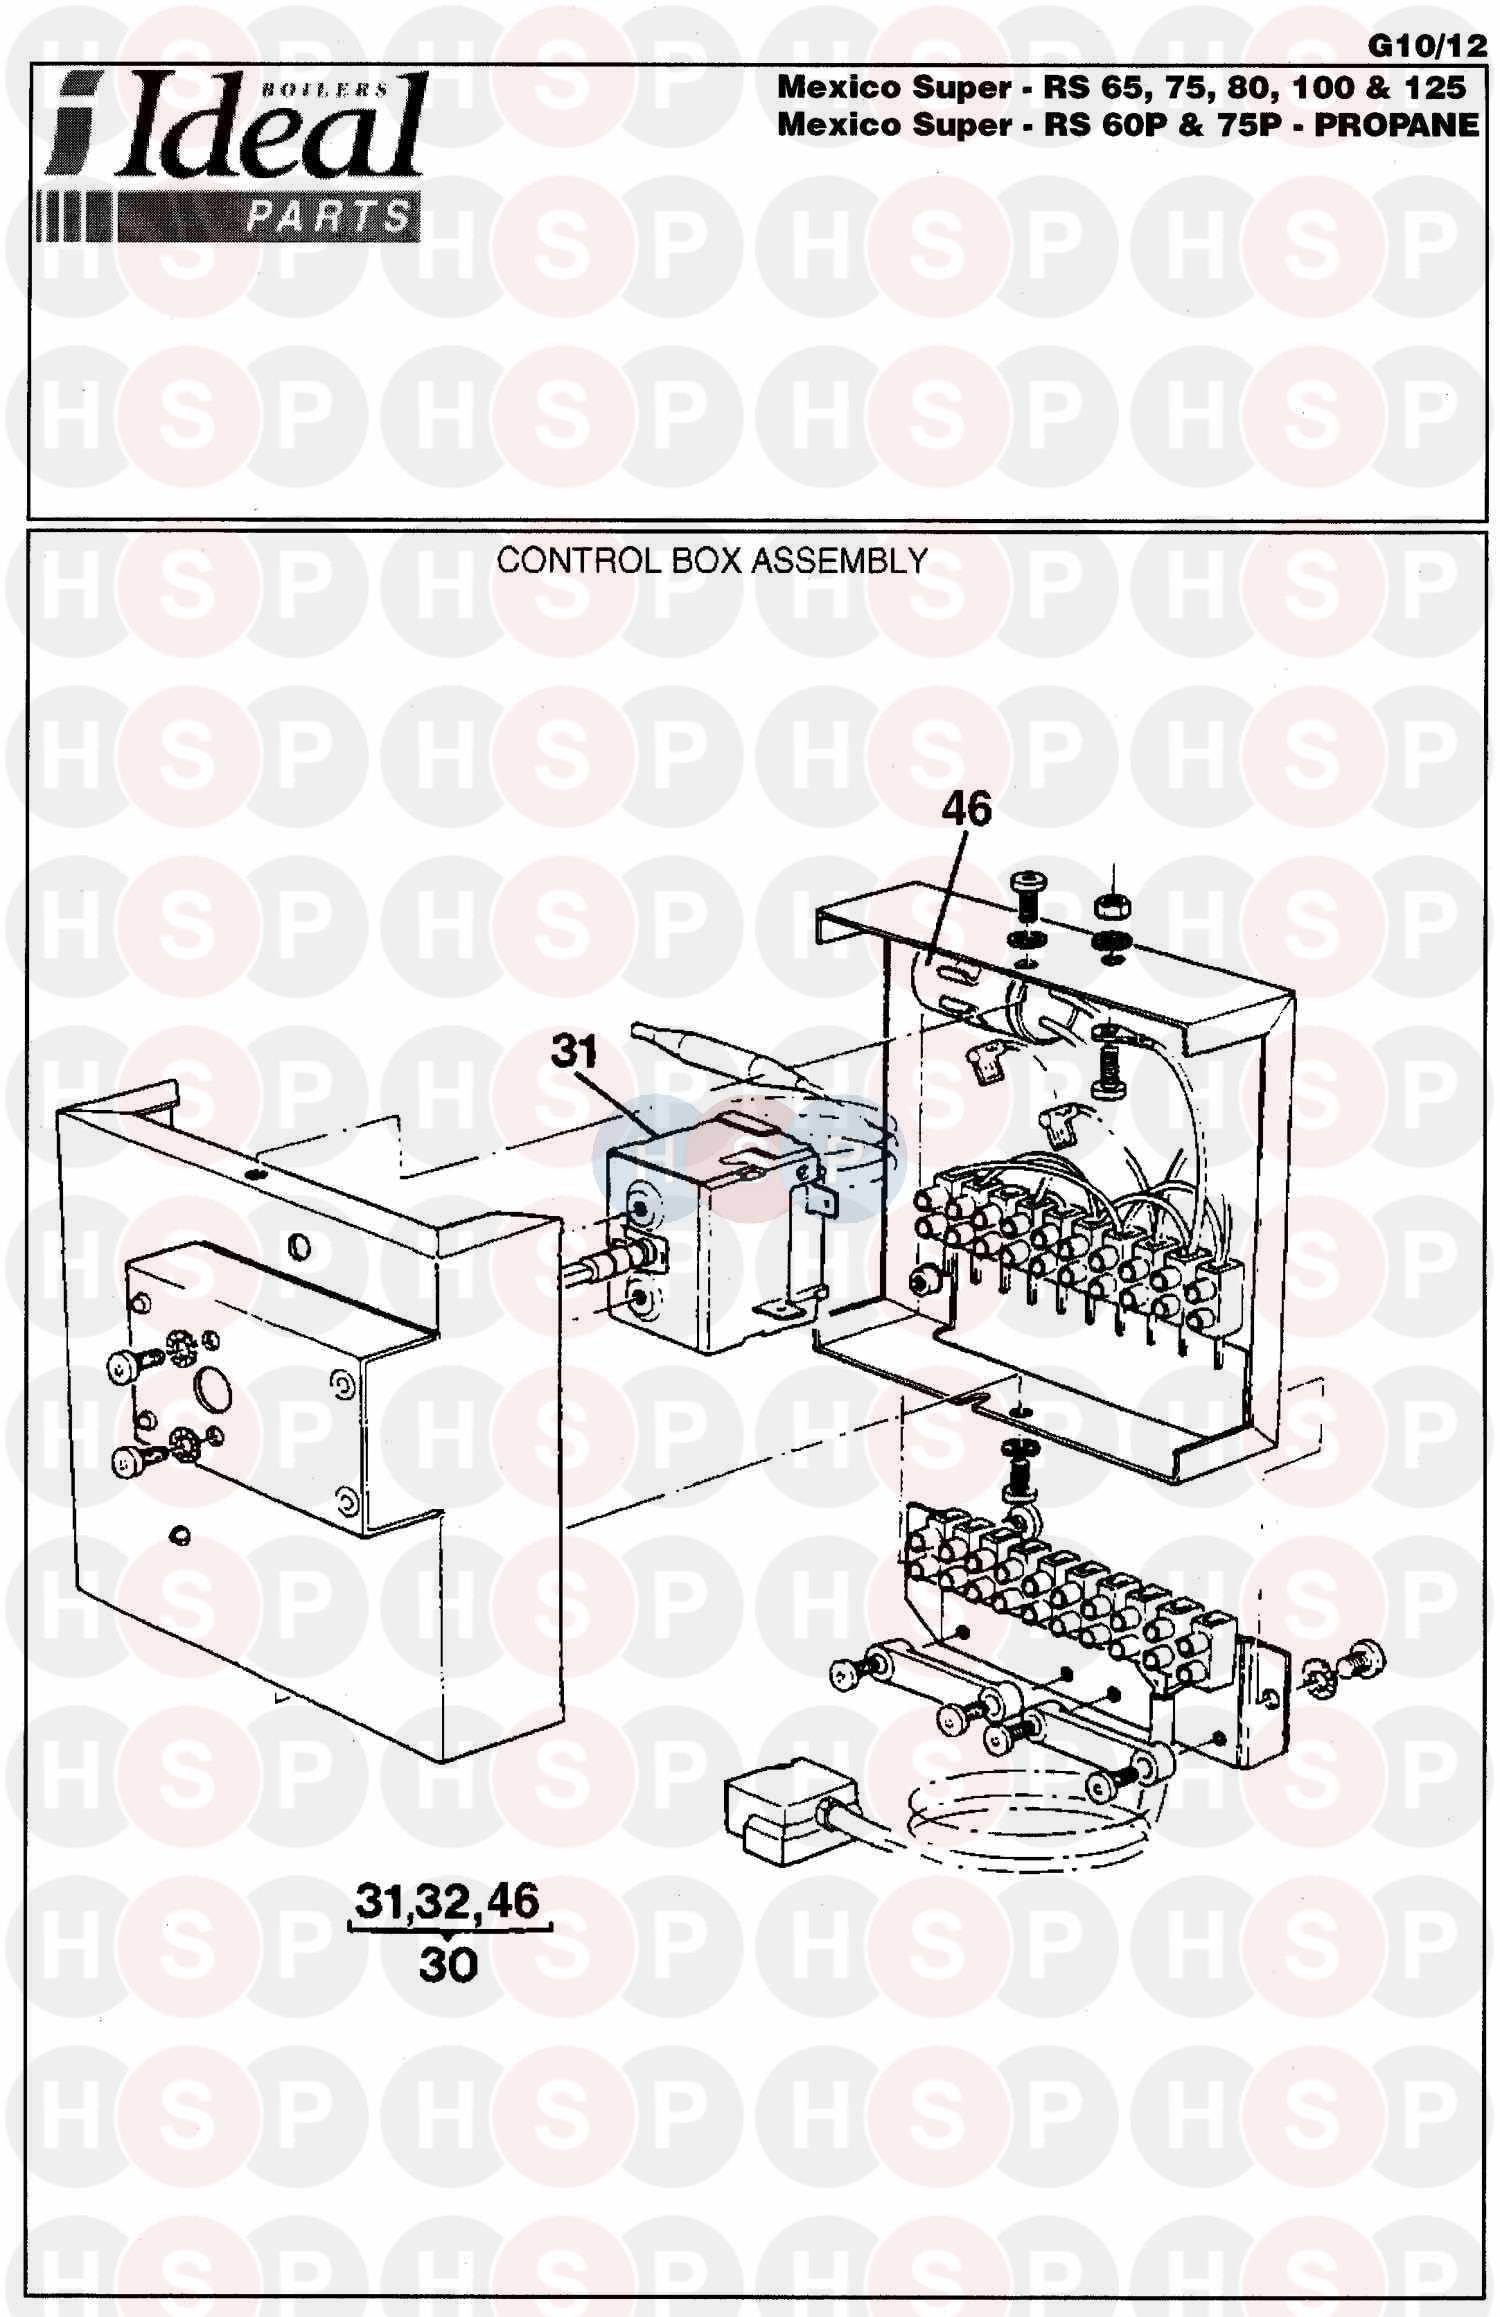 Ideal MEXICO SUPER RS 100 Appliance Diagram (Control Box